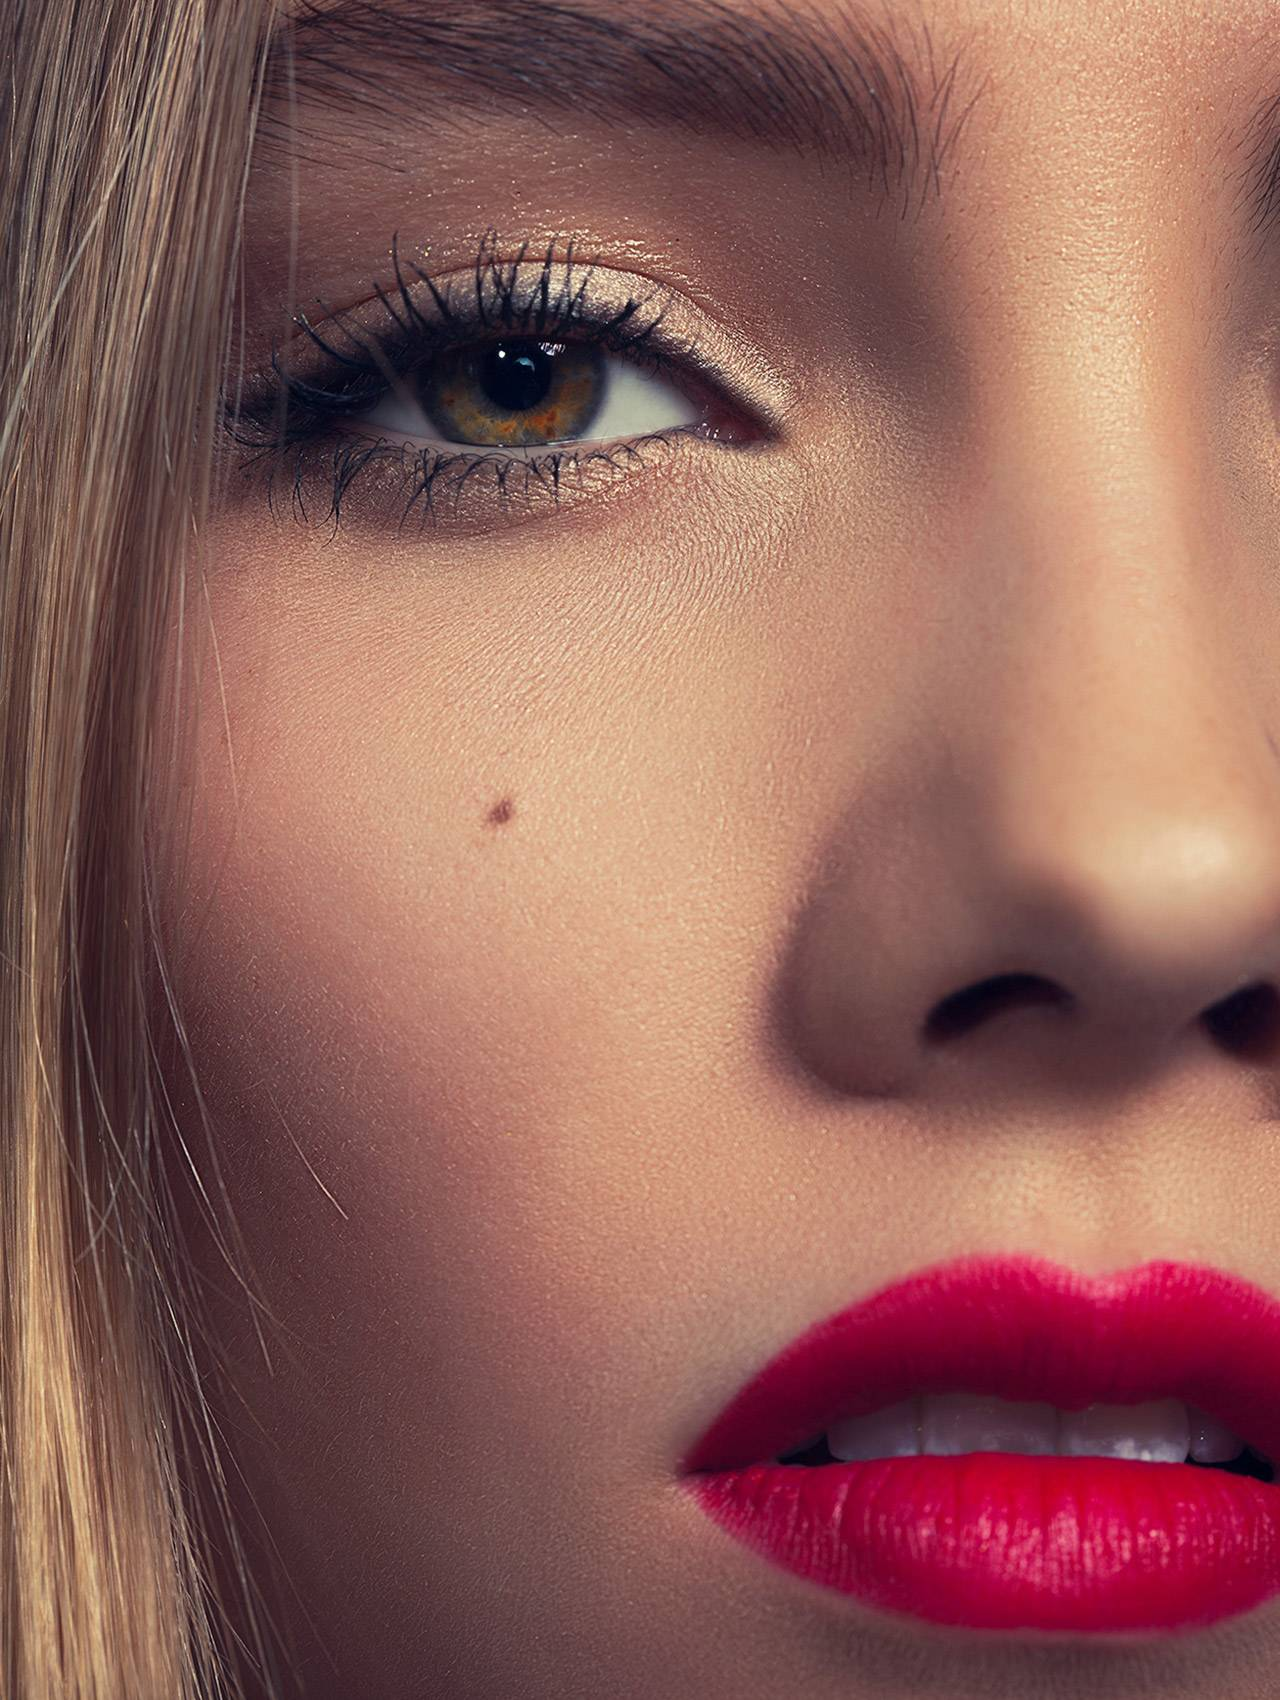 eyeCLOSE.jpg